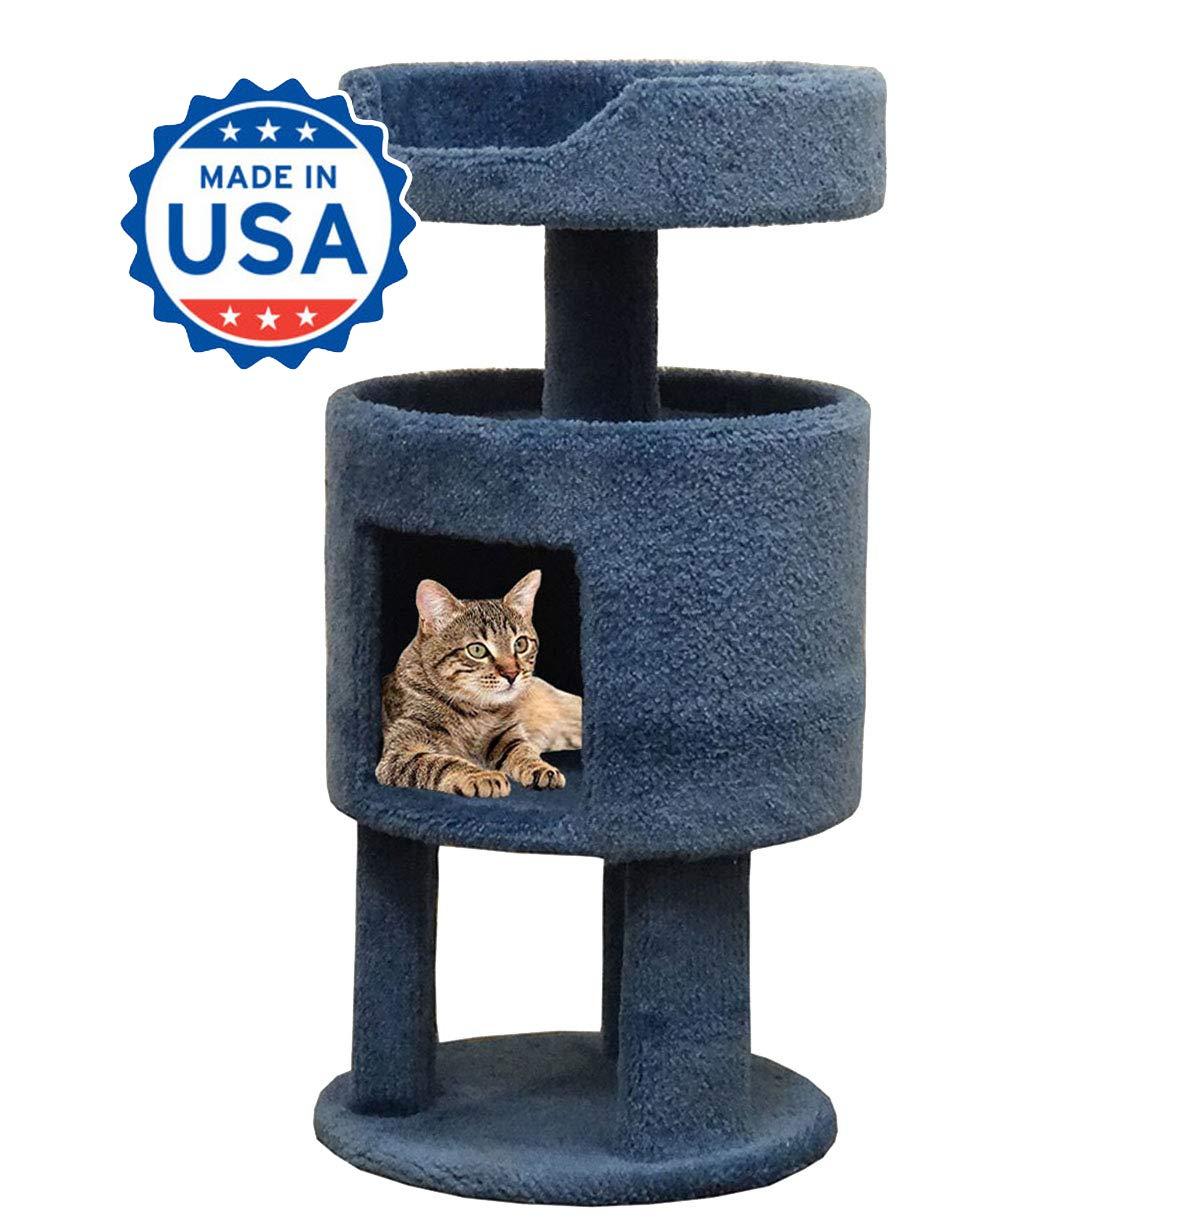 Wood Kitty Condo Carpet Cat Perch, Blue Carpet by CozyCatFurniture